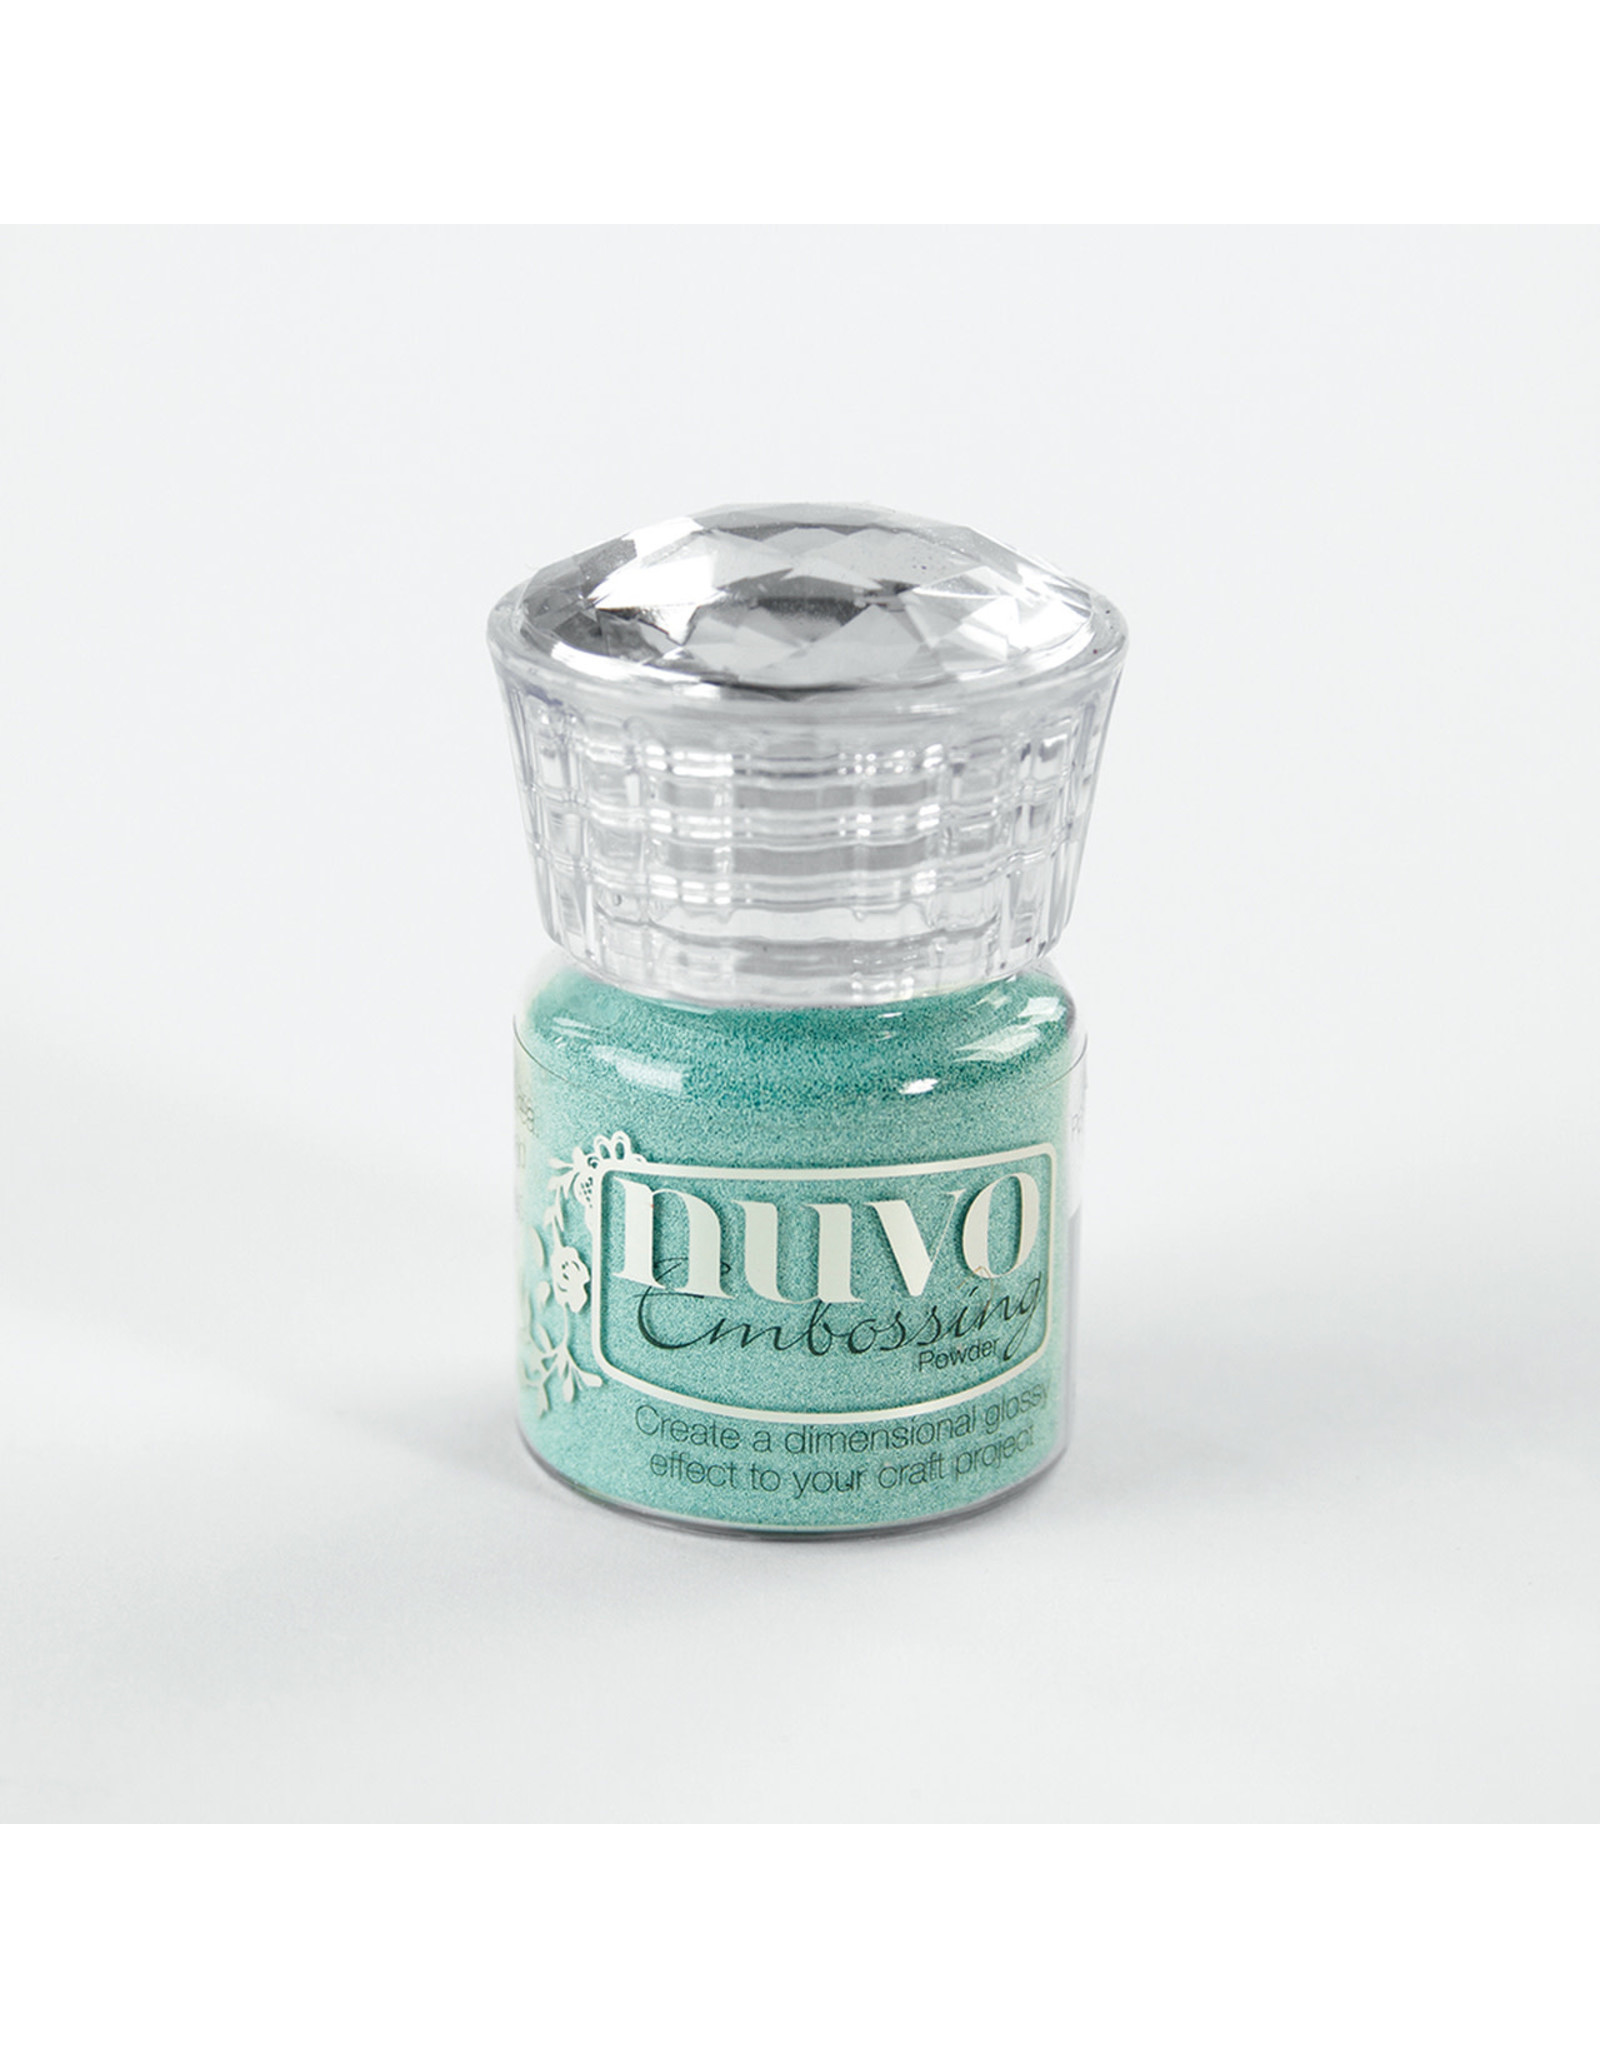 Nuvo Nuvo Embossing Powder - Cool Jade